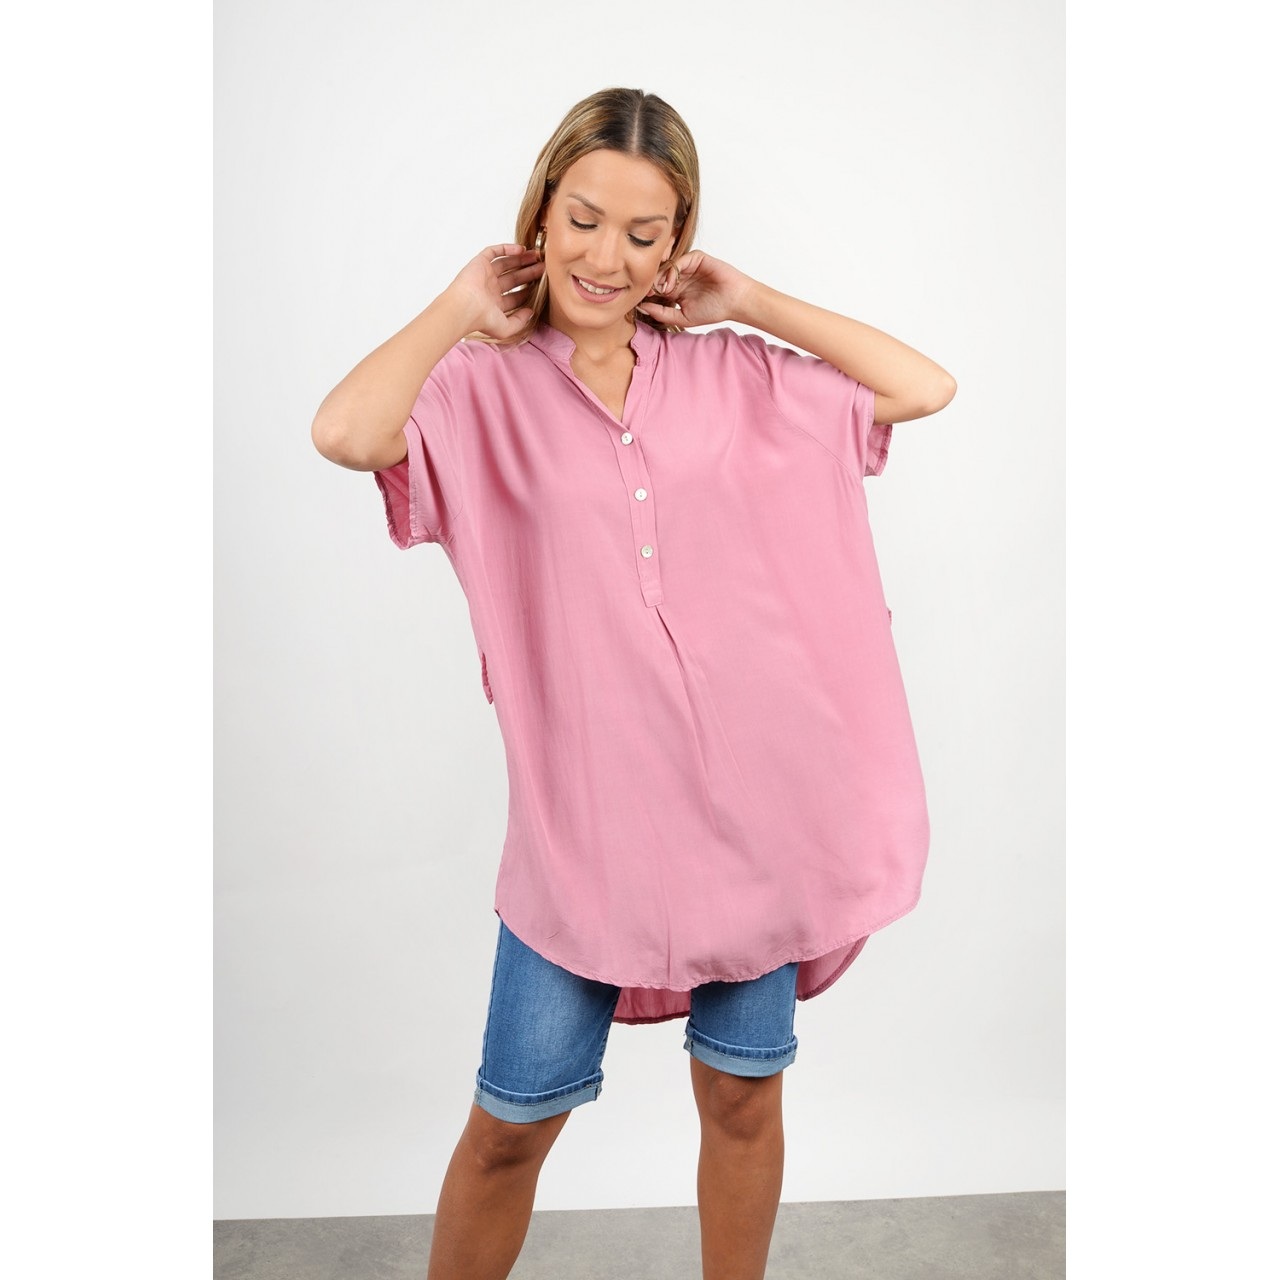 Oversized asymmetrical shirt with belt